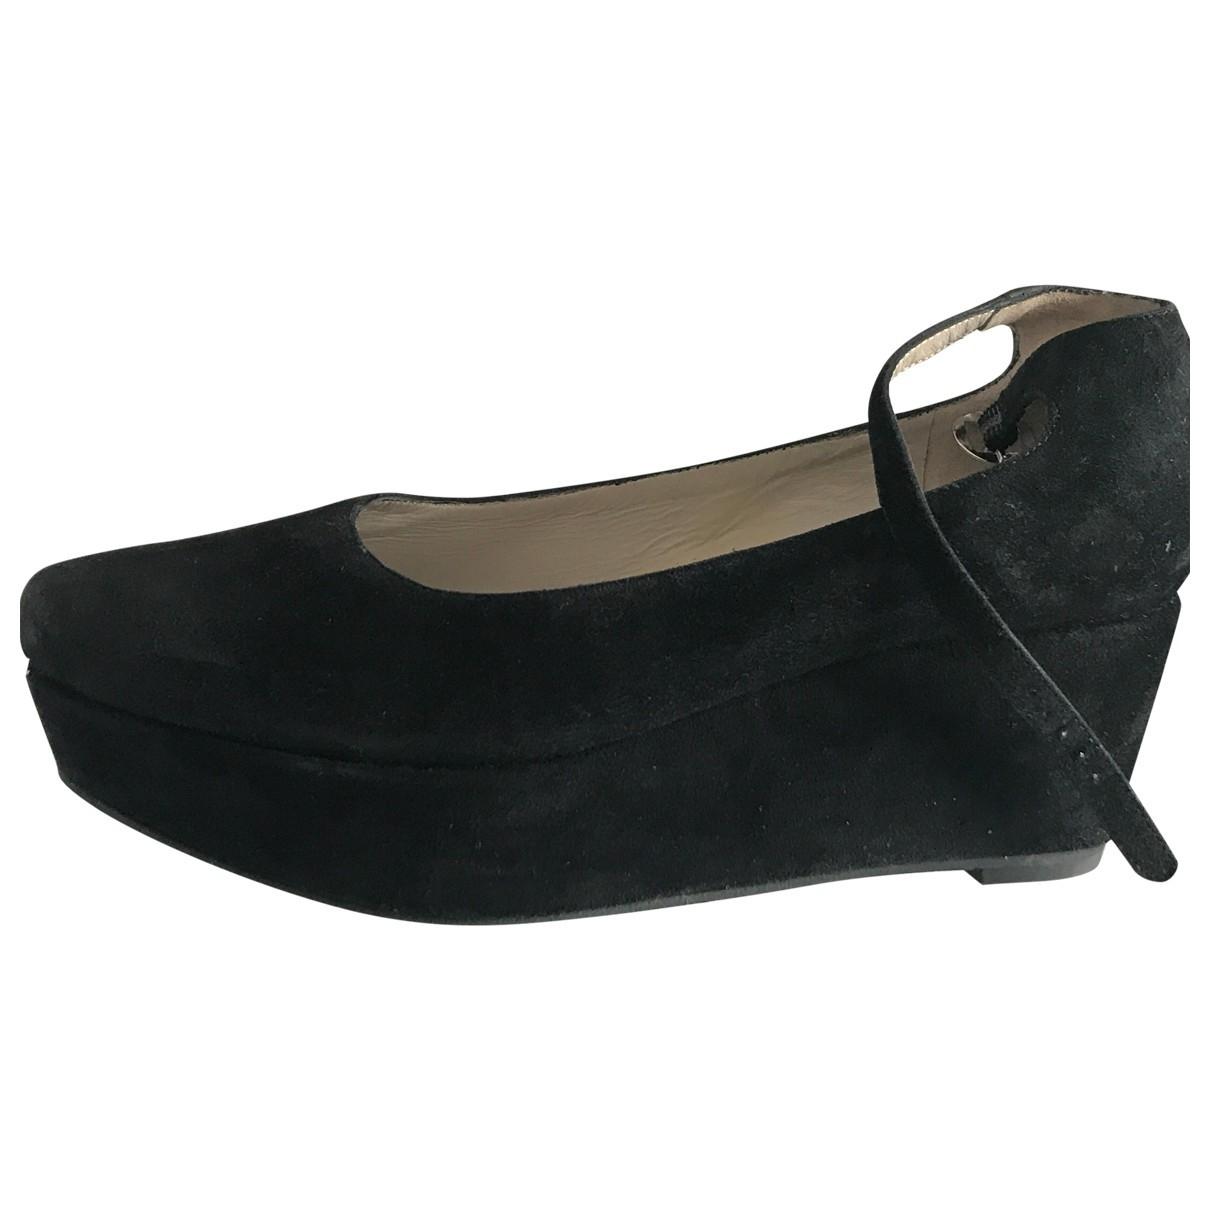 Robert Clergerie \N Black Suede Heels for Women 6 UK